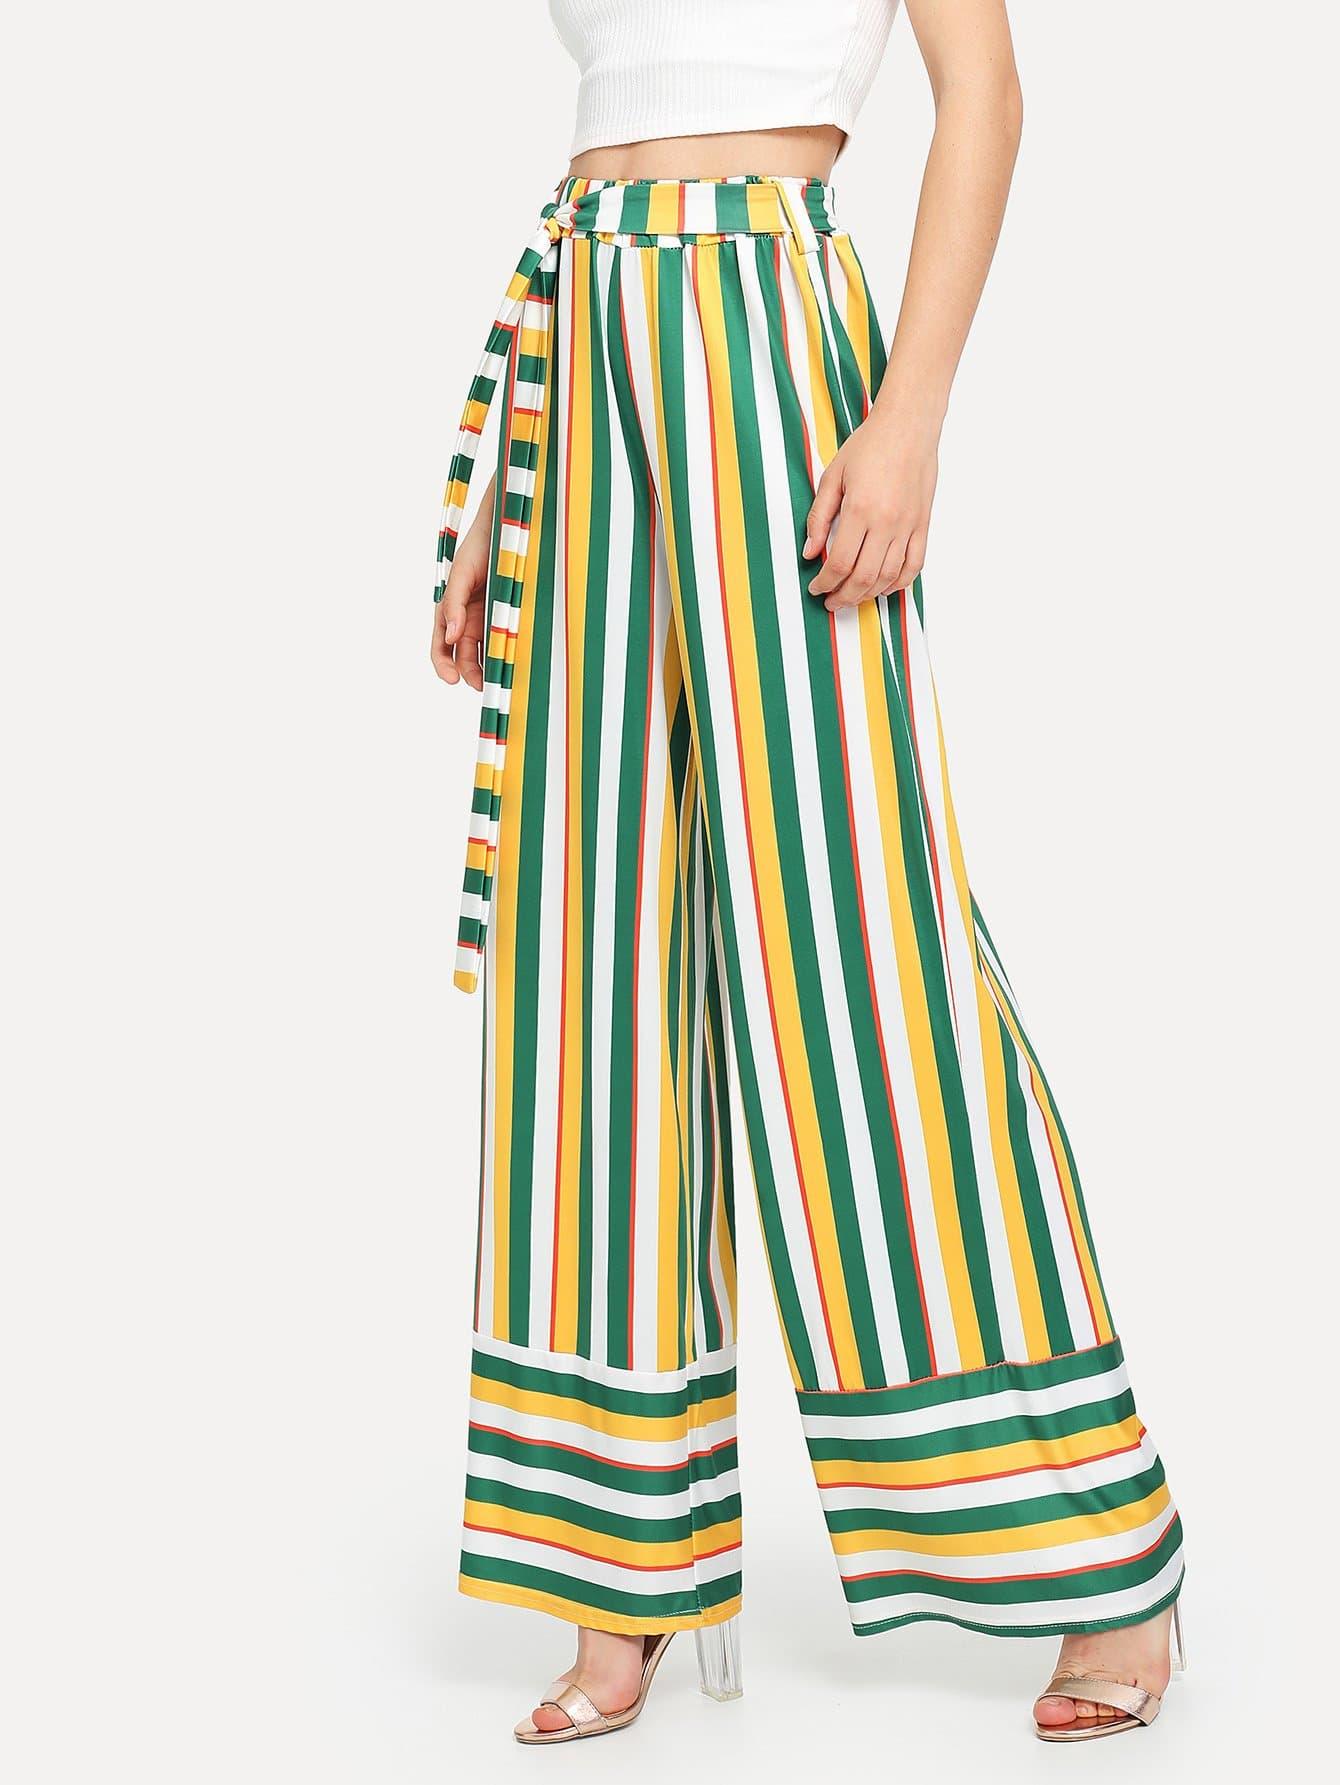 Self Tie Waist Striped Wide Leg Pants striped self tie waist dress